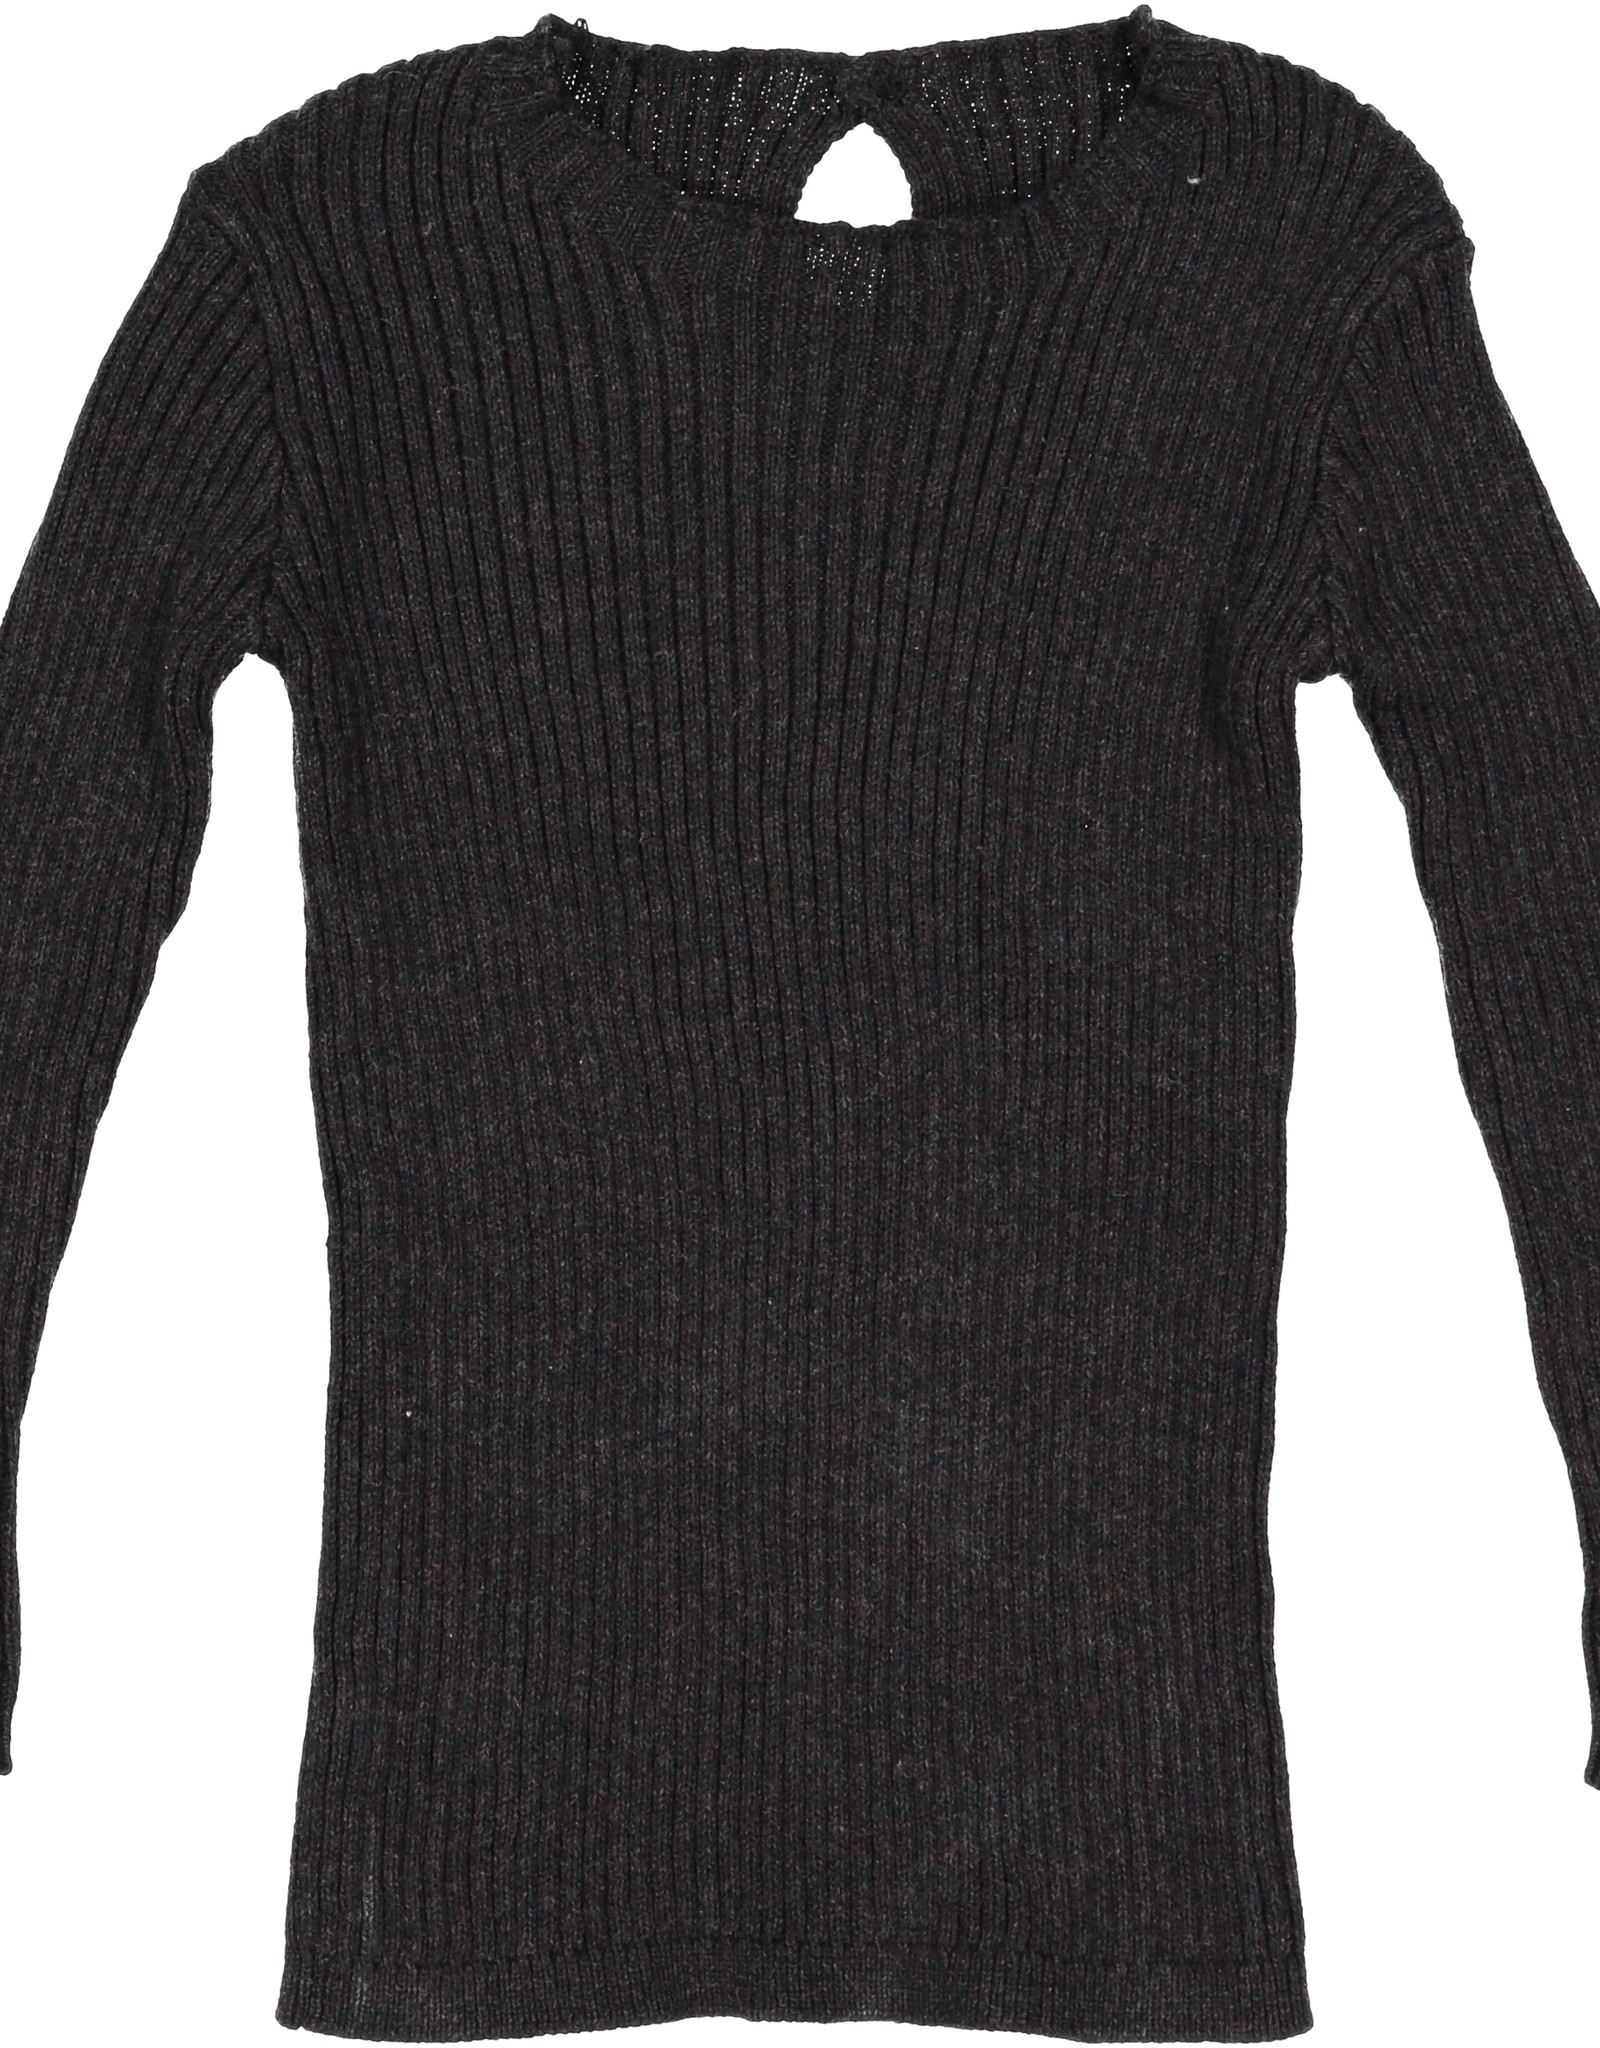 Analogie Rib Knit Sweater